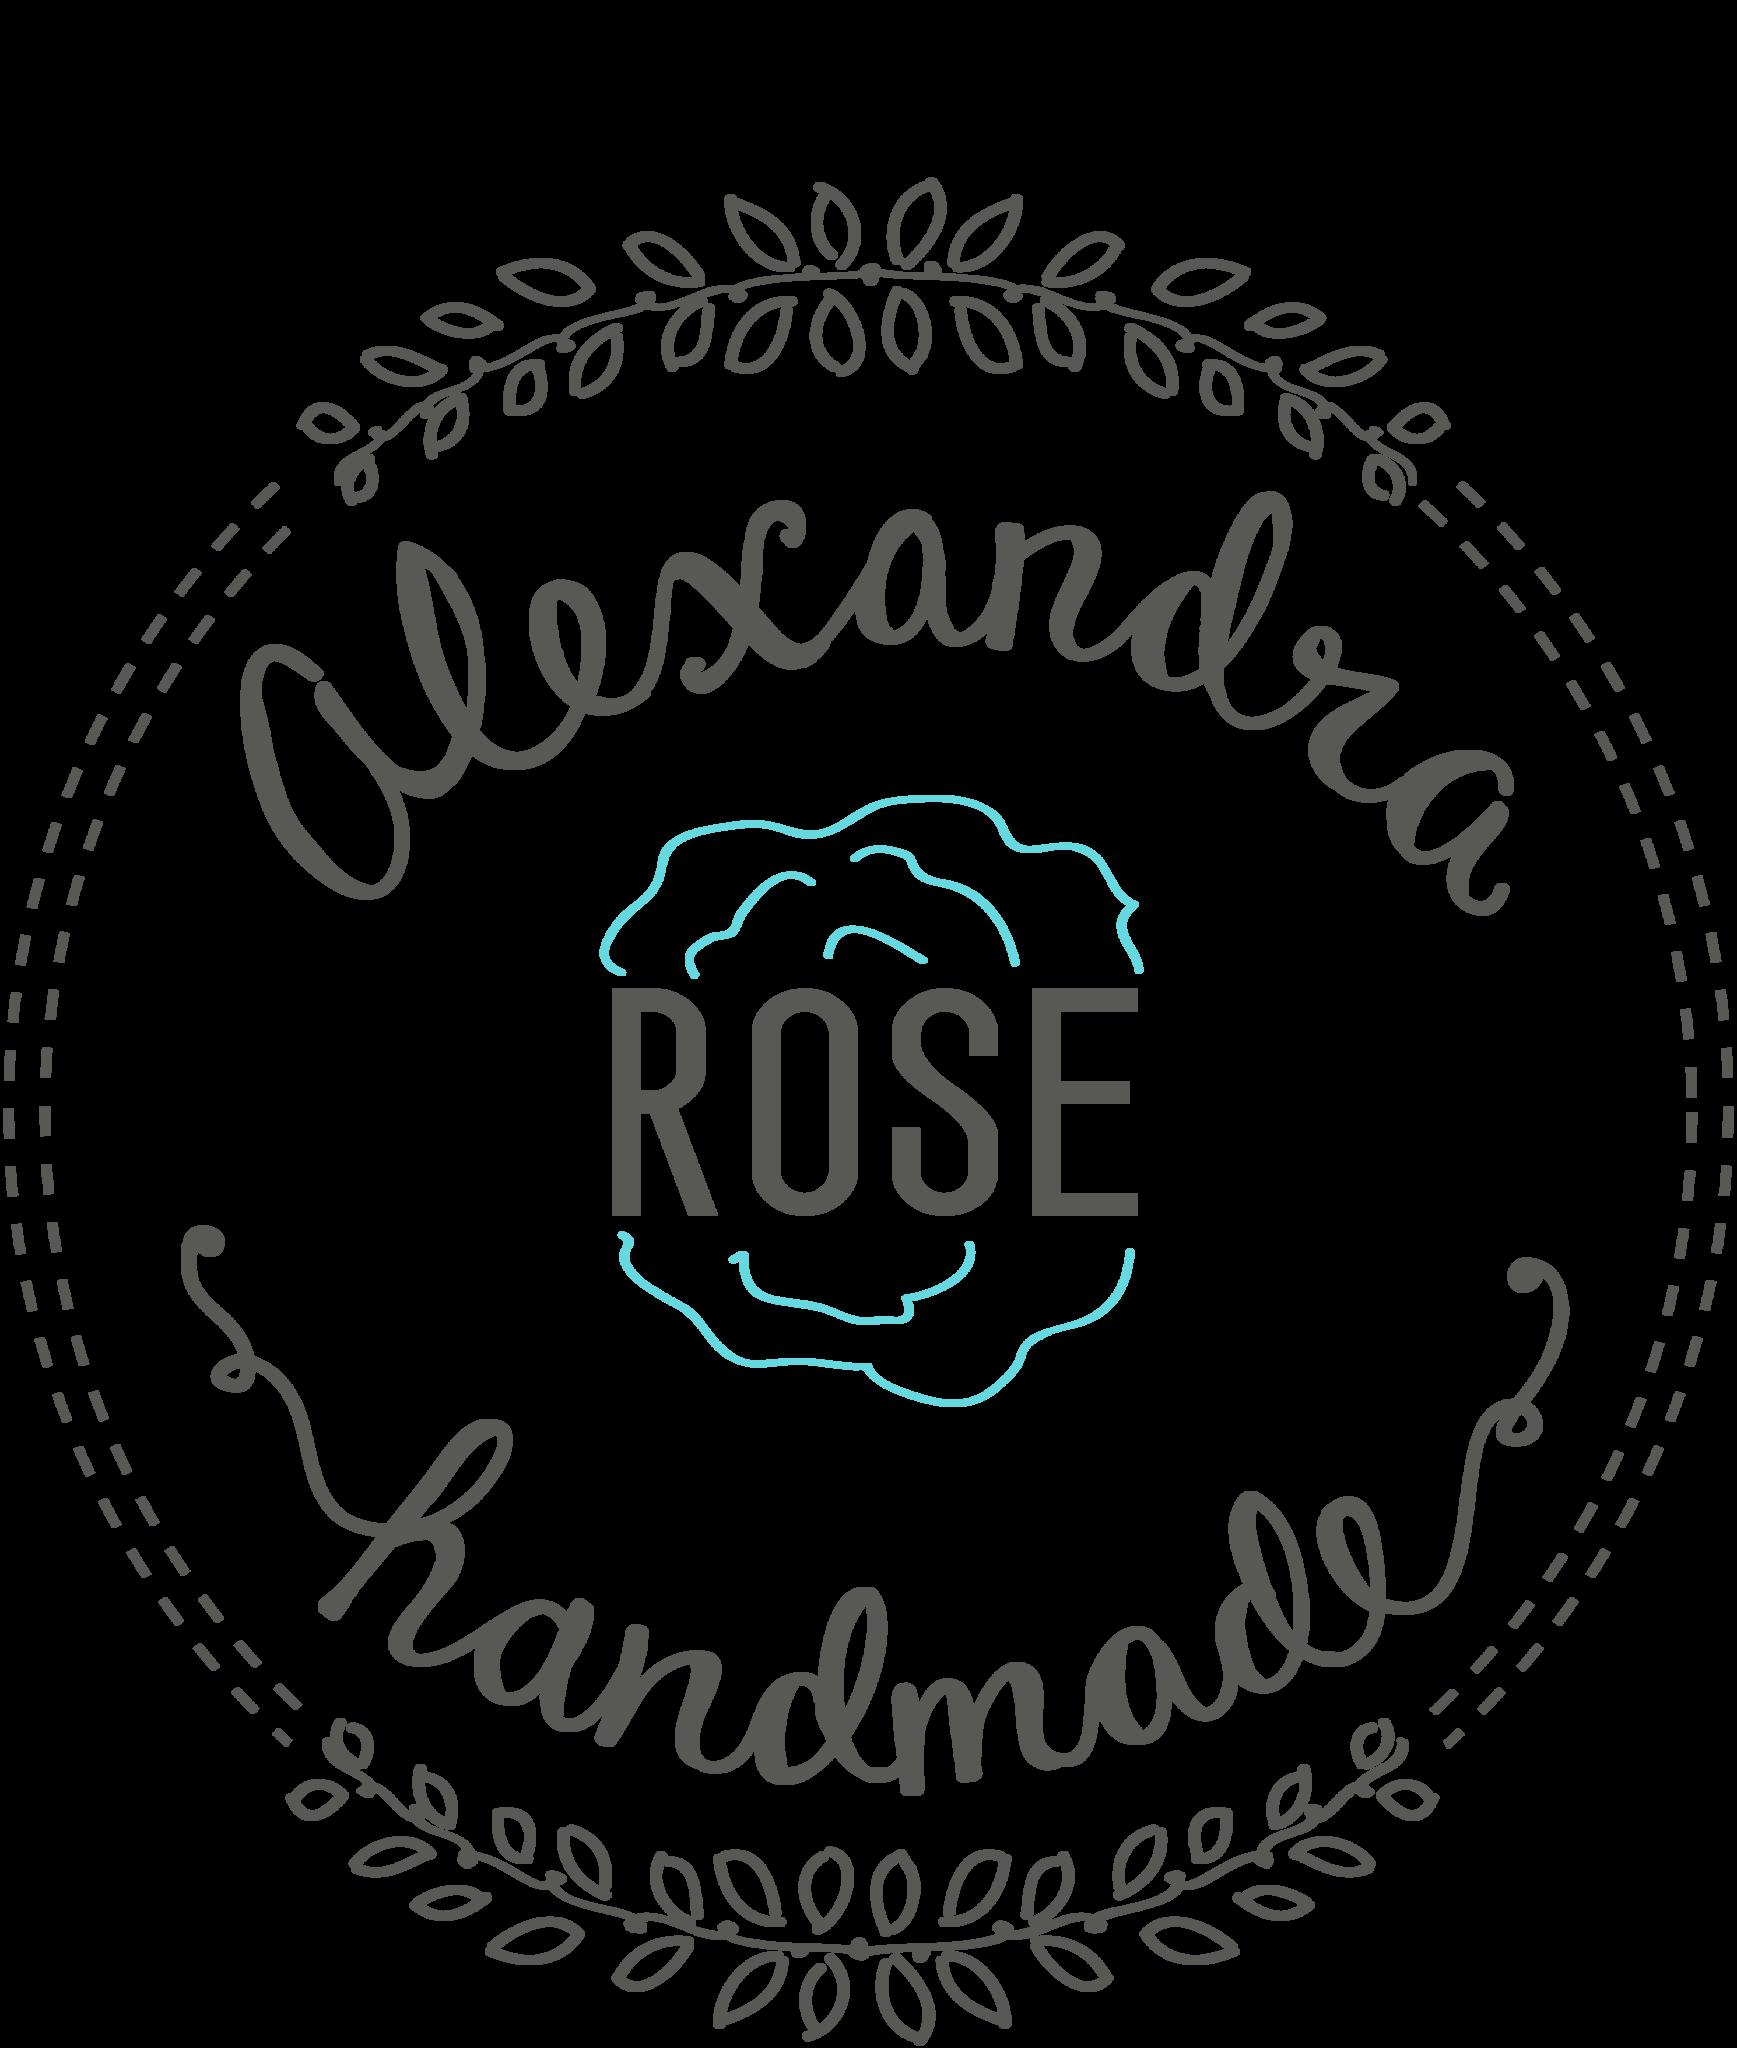 1737x2048 Gift Card Alexandra Rose Handmade